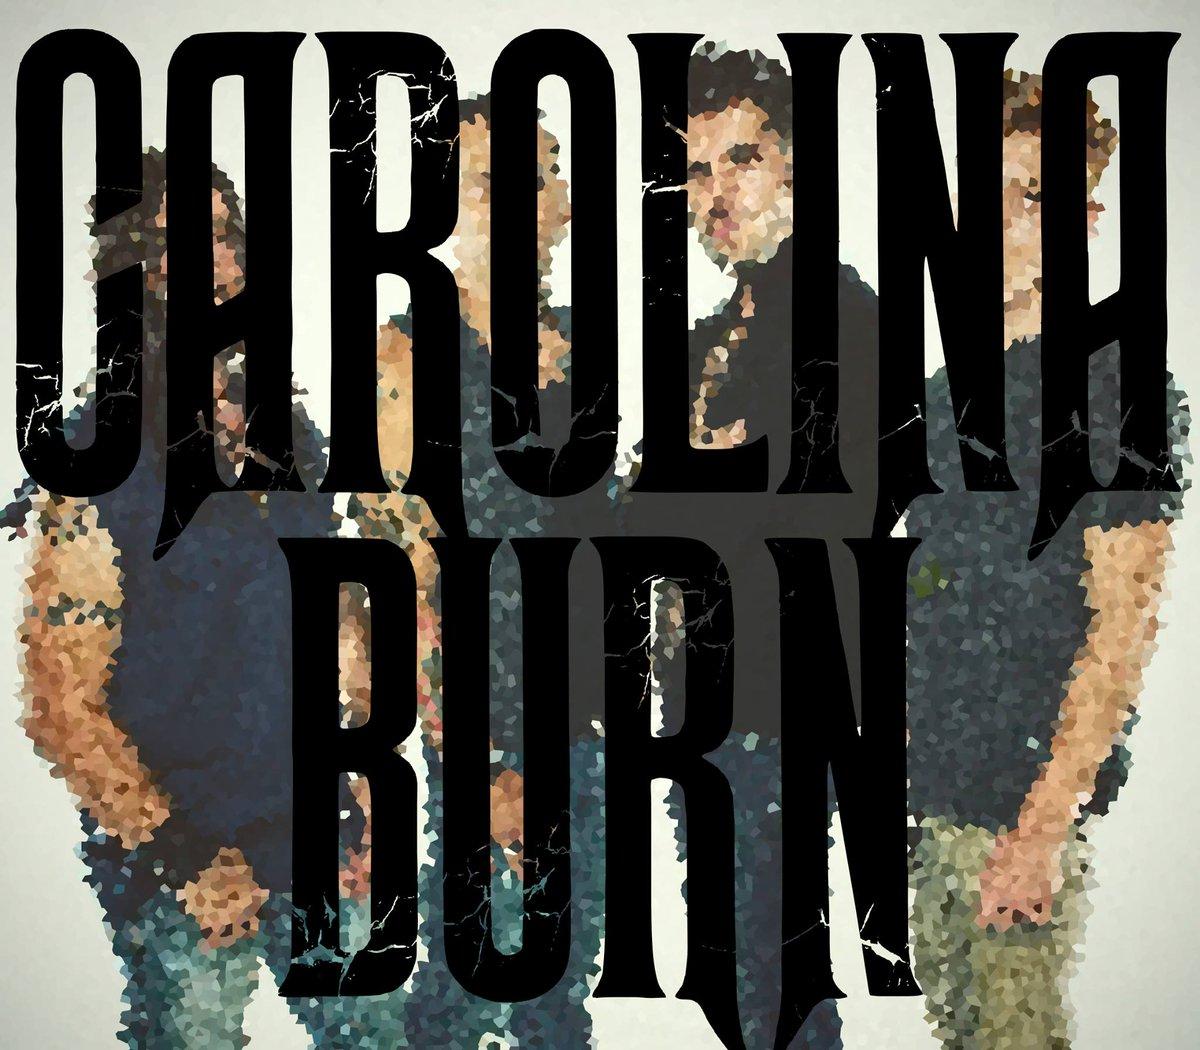 CAROLINA BURN @carolina_burn #nowplaying #Tunein #indiemusic On The KILLOGIC EFFECT @granitecoastent  http:// granitecoastentertainment.weebly.com/listen-live.ht ml &nbsp; … <br>http://pic.twitter.com/KW8MTqS5ti